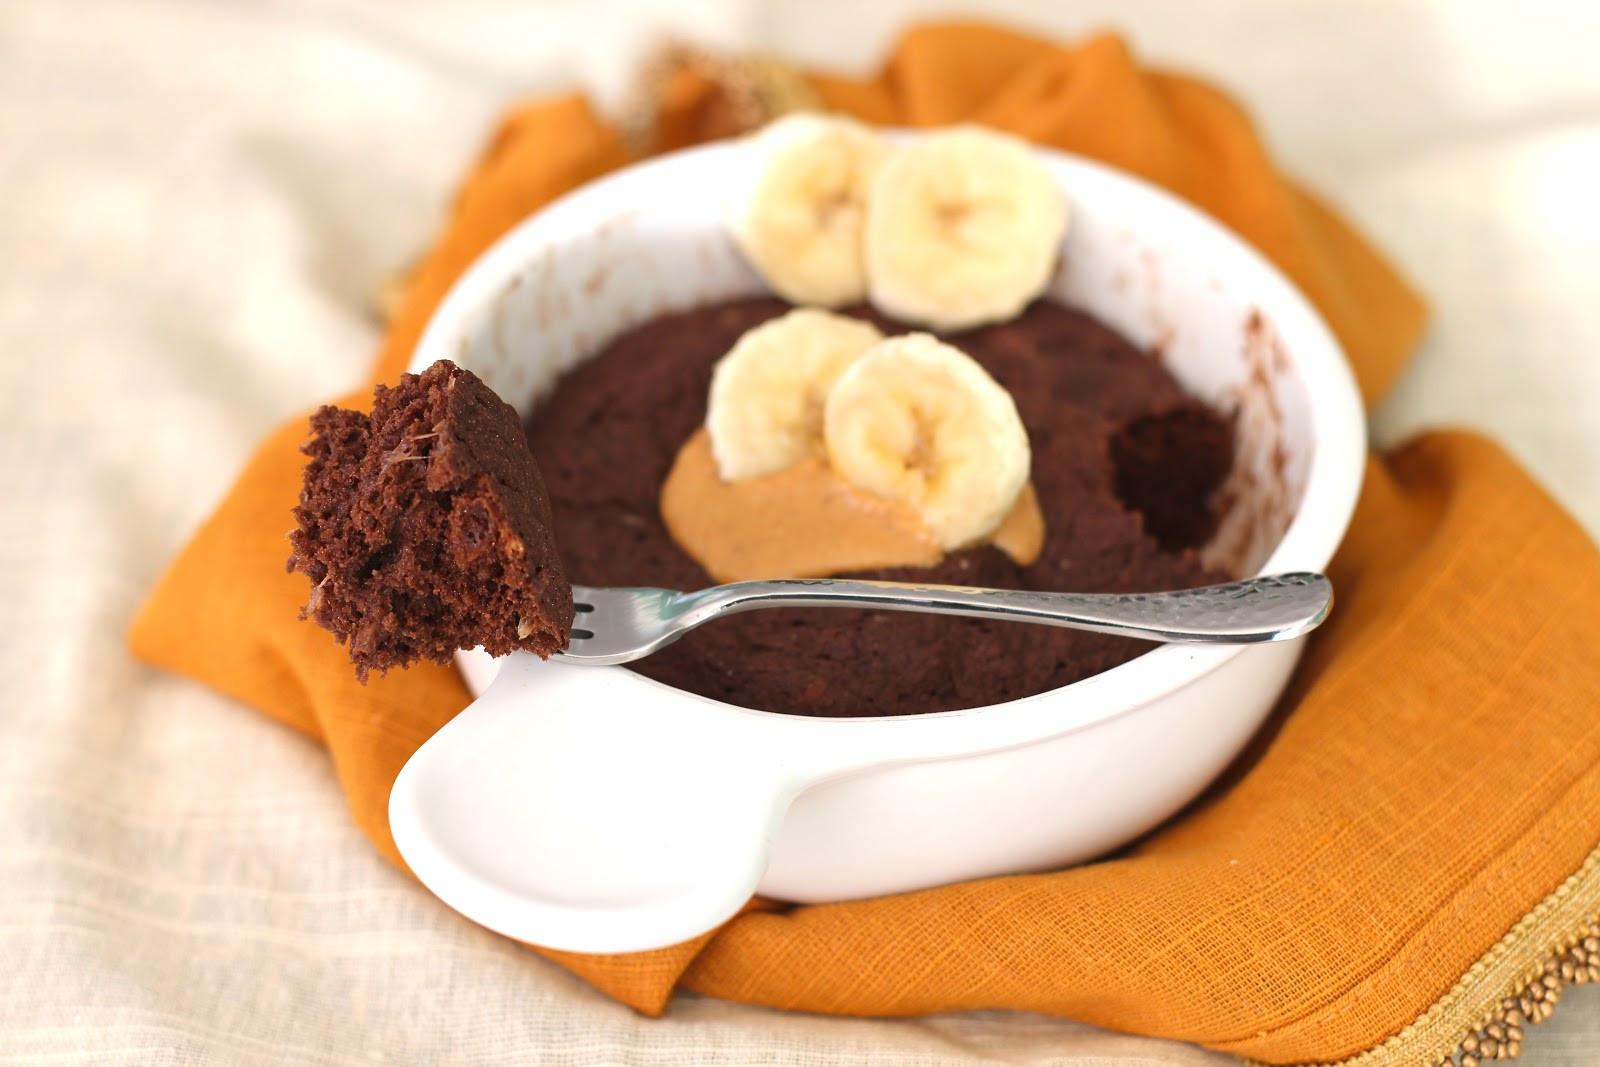 Healthy Banana Dessert  Healthy Single Serving Chocolate Peanut Butter Banana